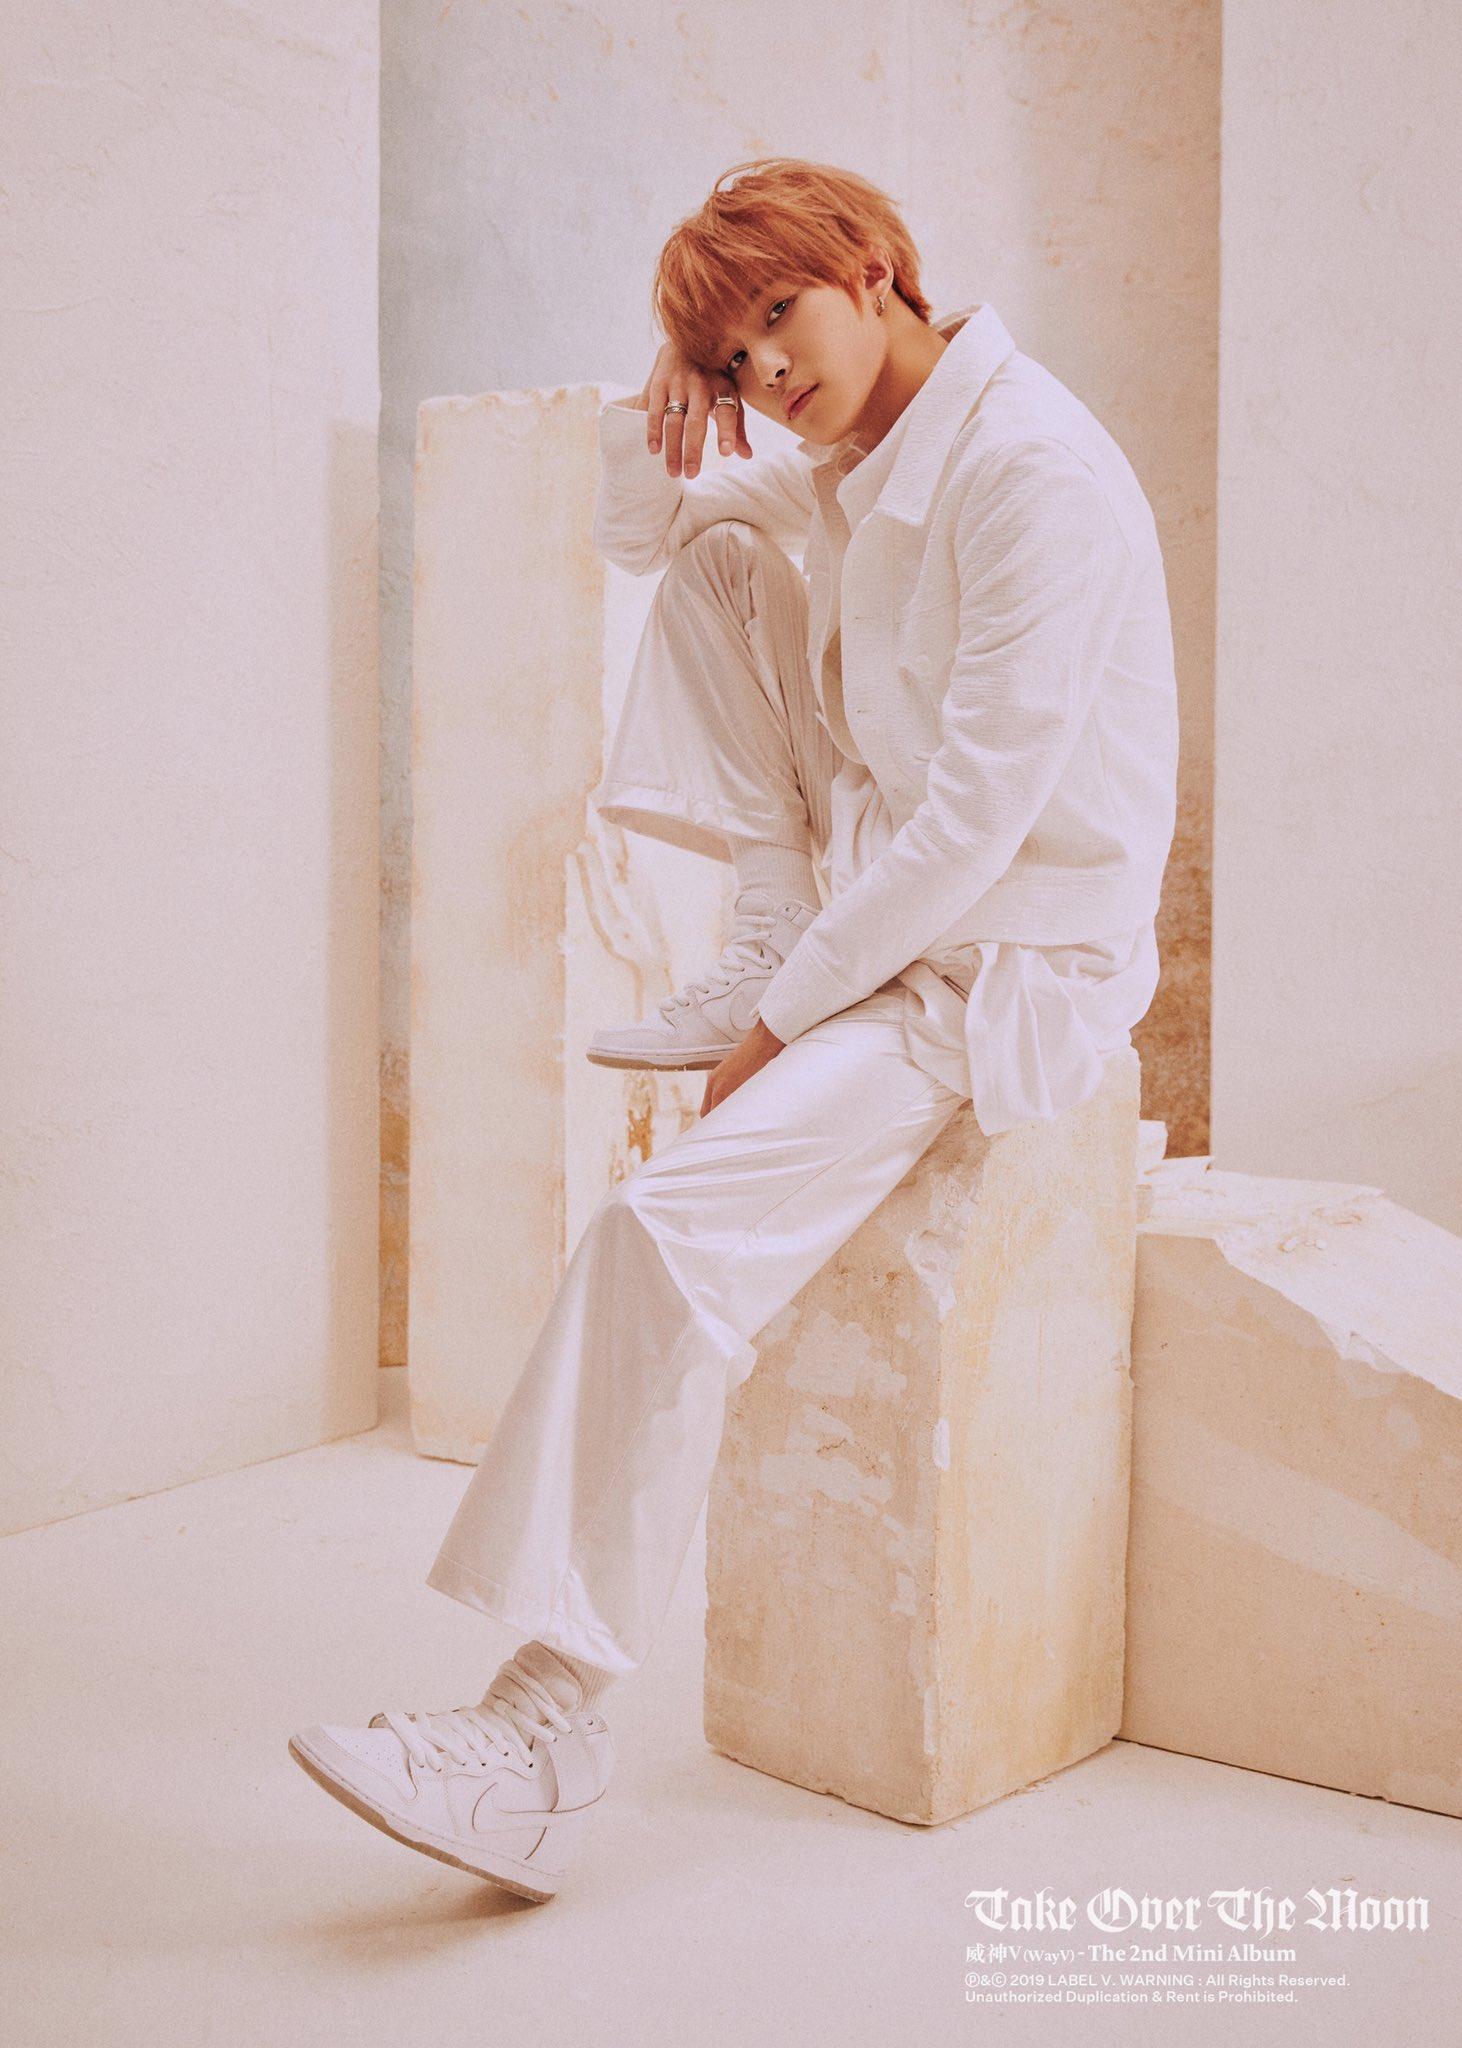 Liu Yangyang Nct Asiachan Kpop Image Board